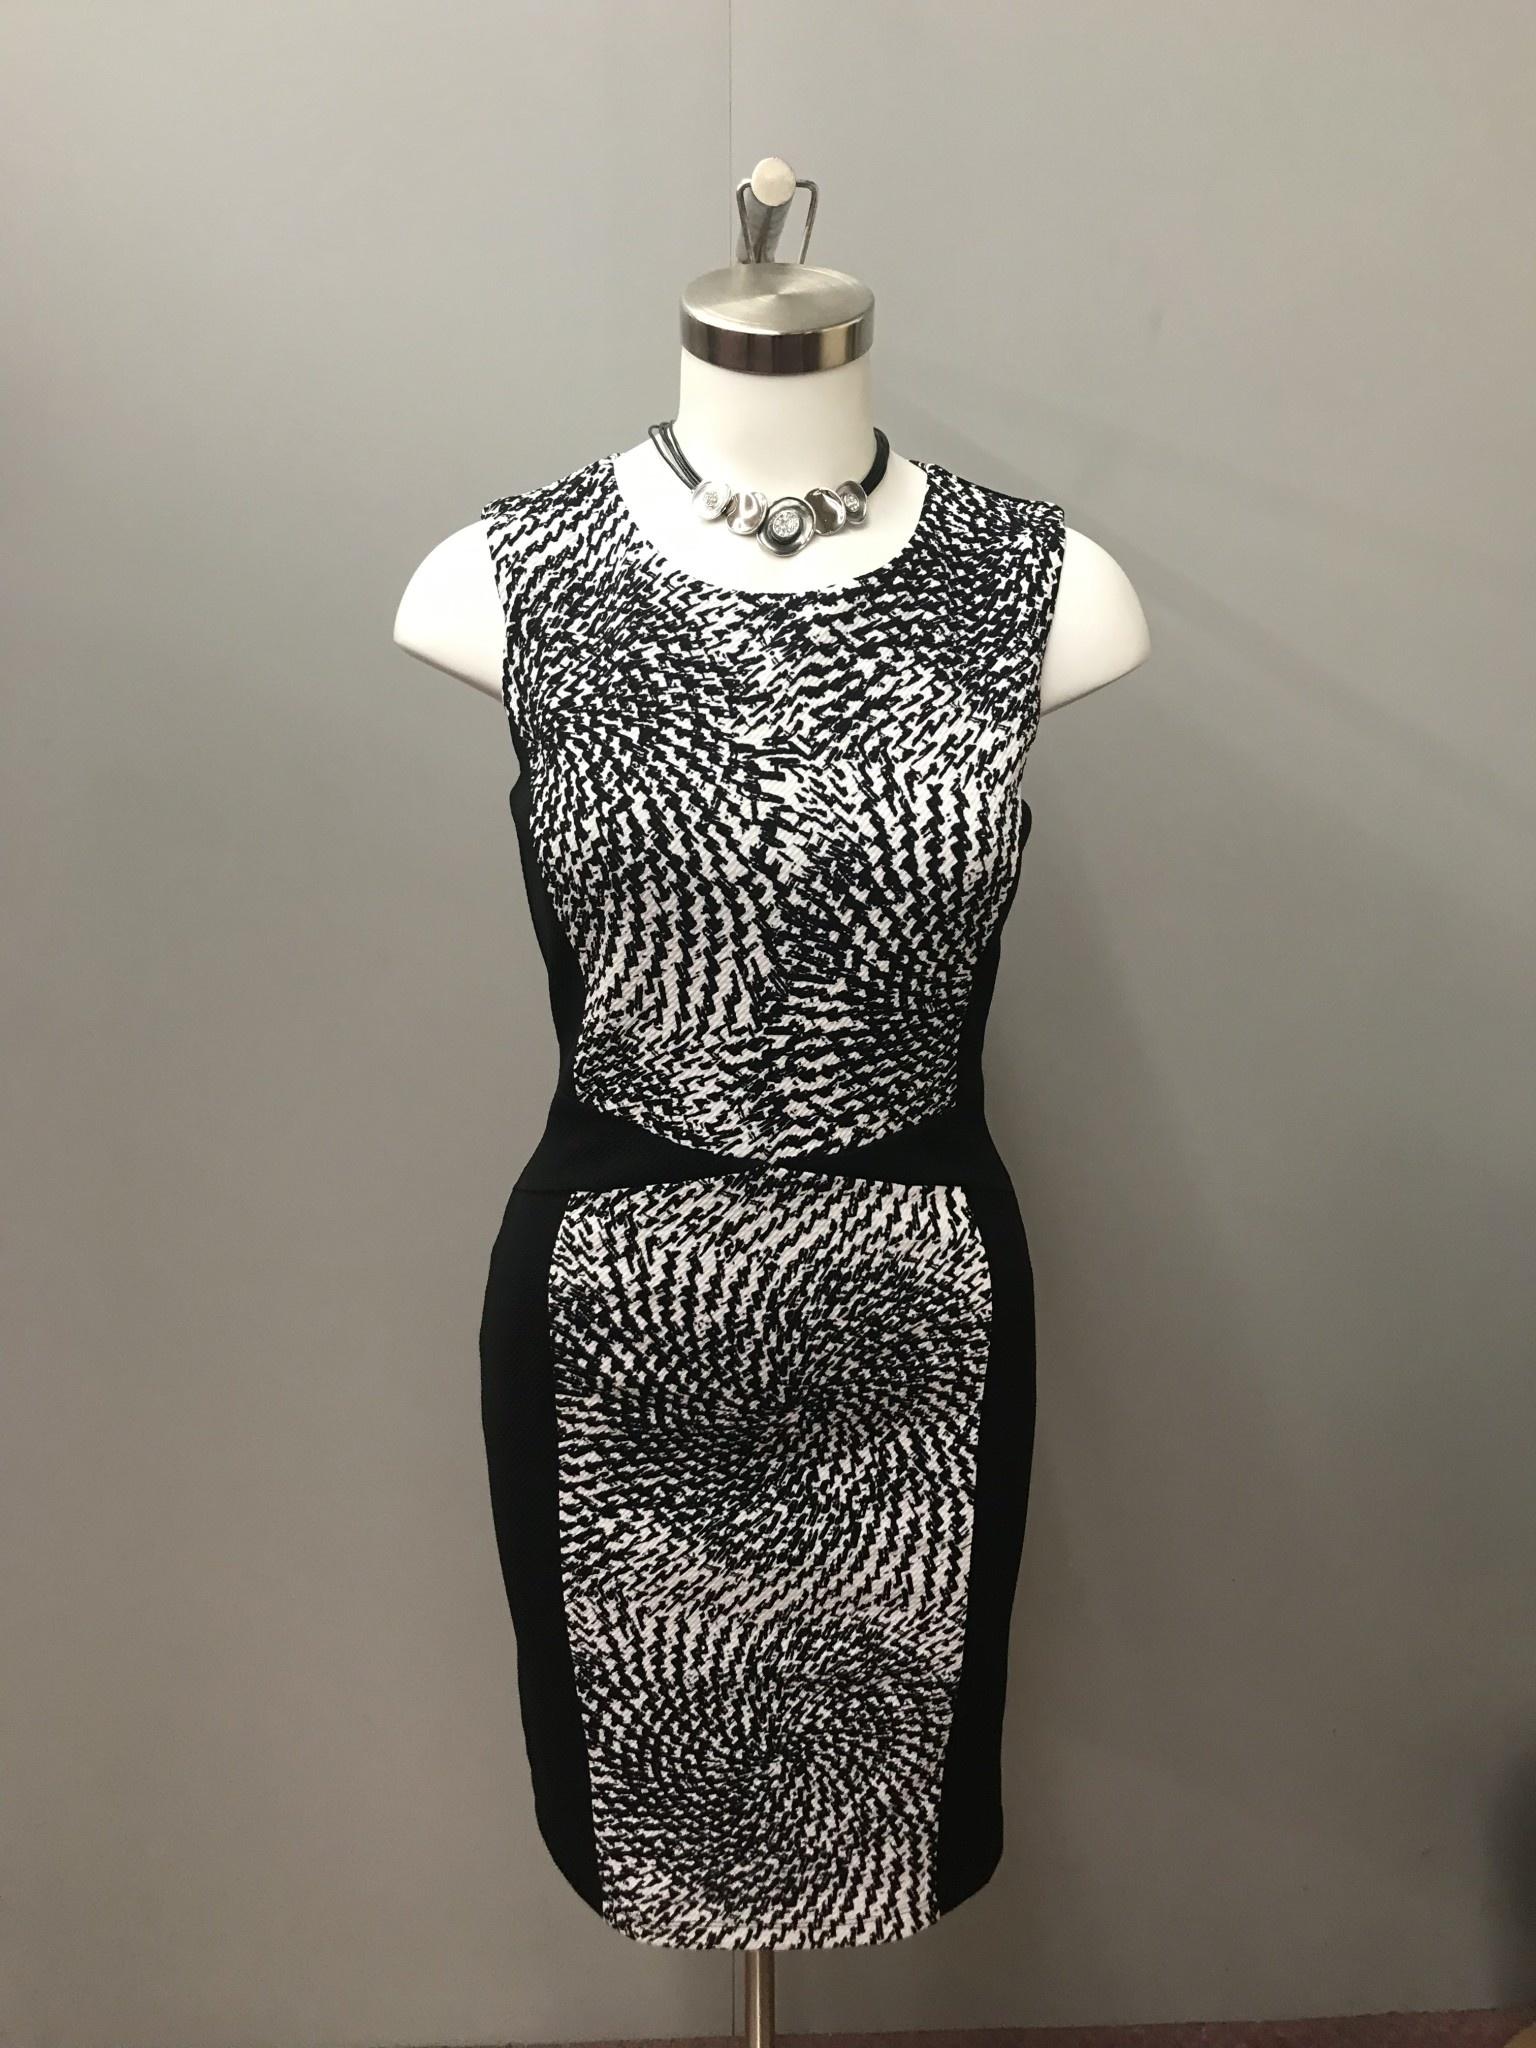 LINEA DOMANI Linea Domani A/S Knit Dress